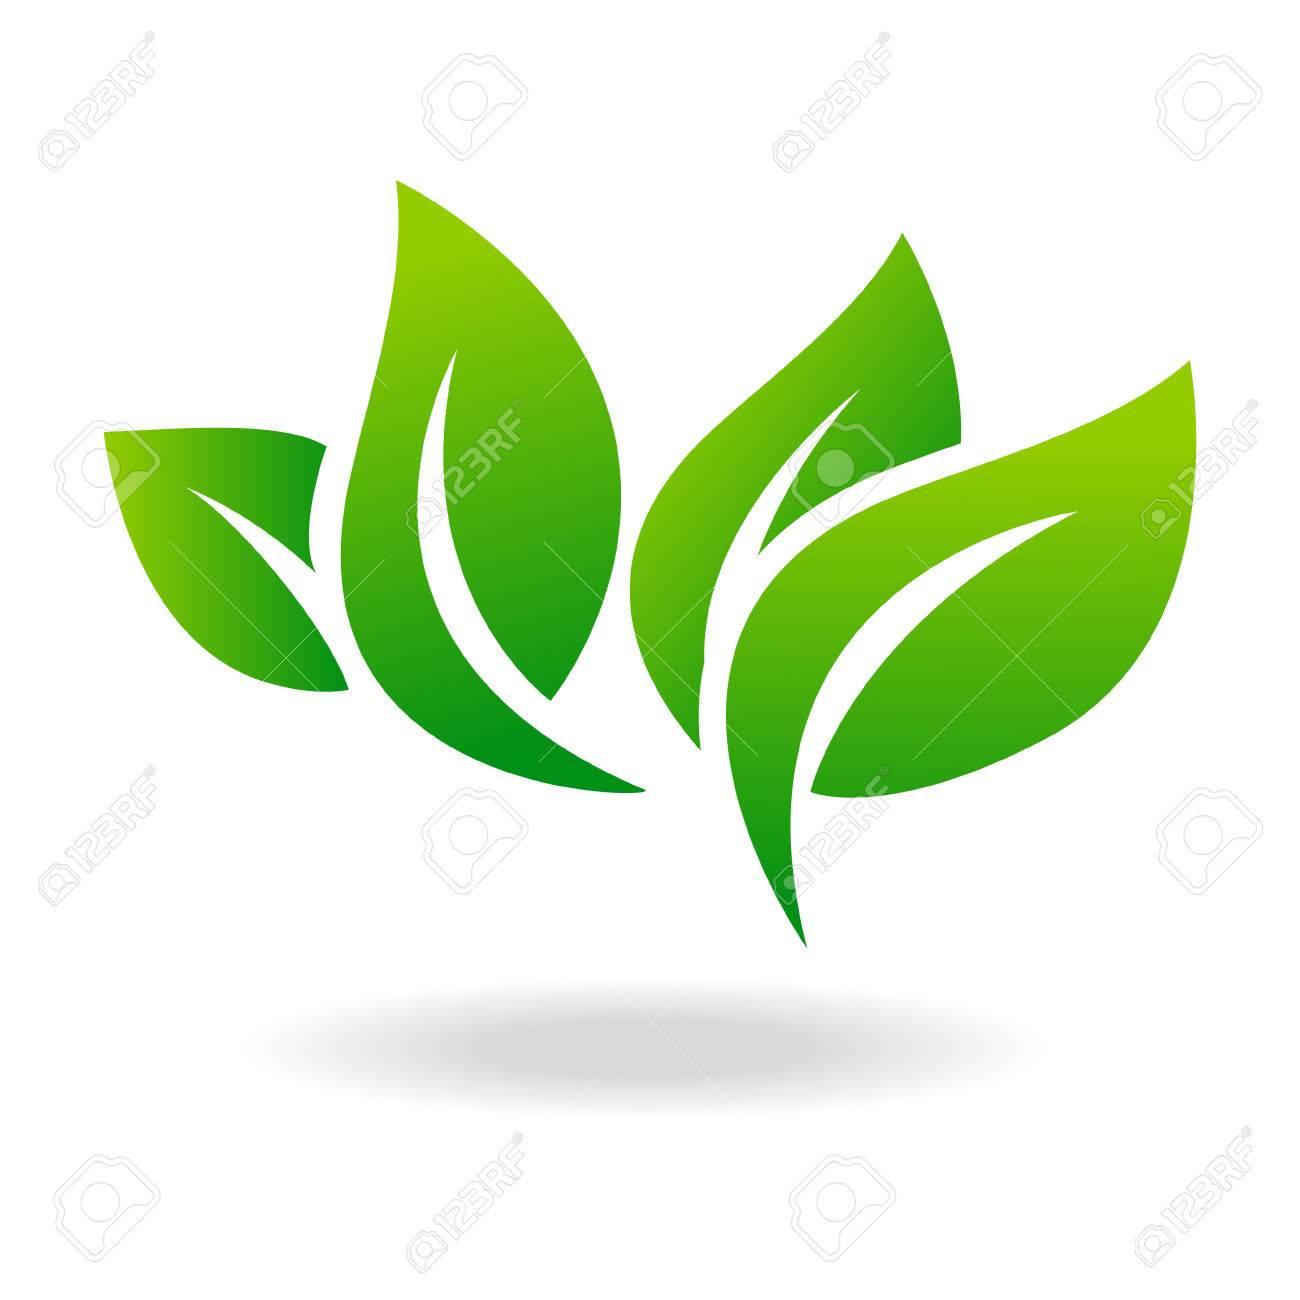 Leaf shape icon and green leaf emblem. Ecology green leaf organic environment, tree leaf . - 59409355